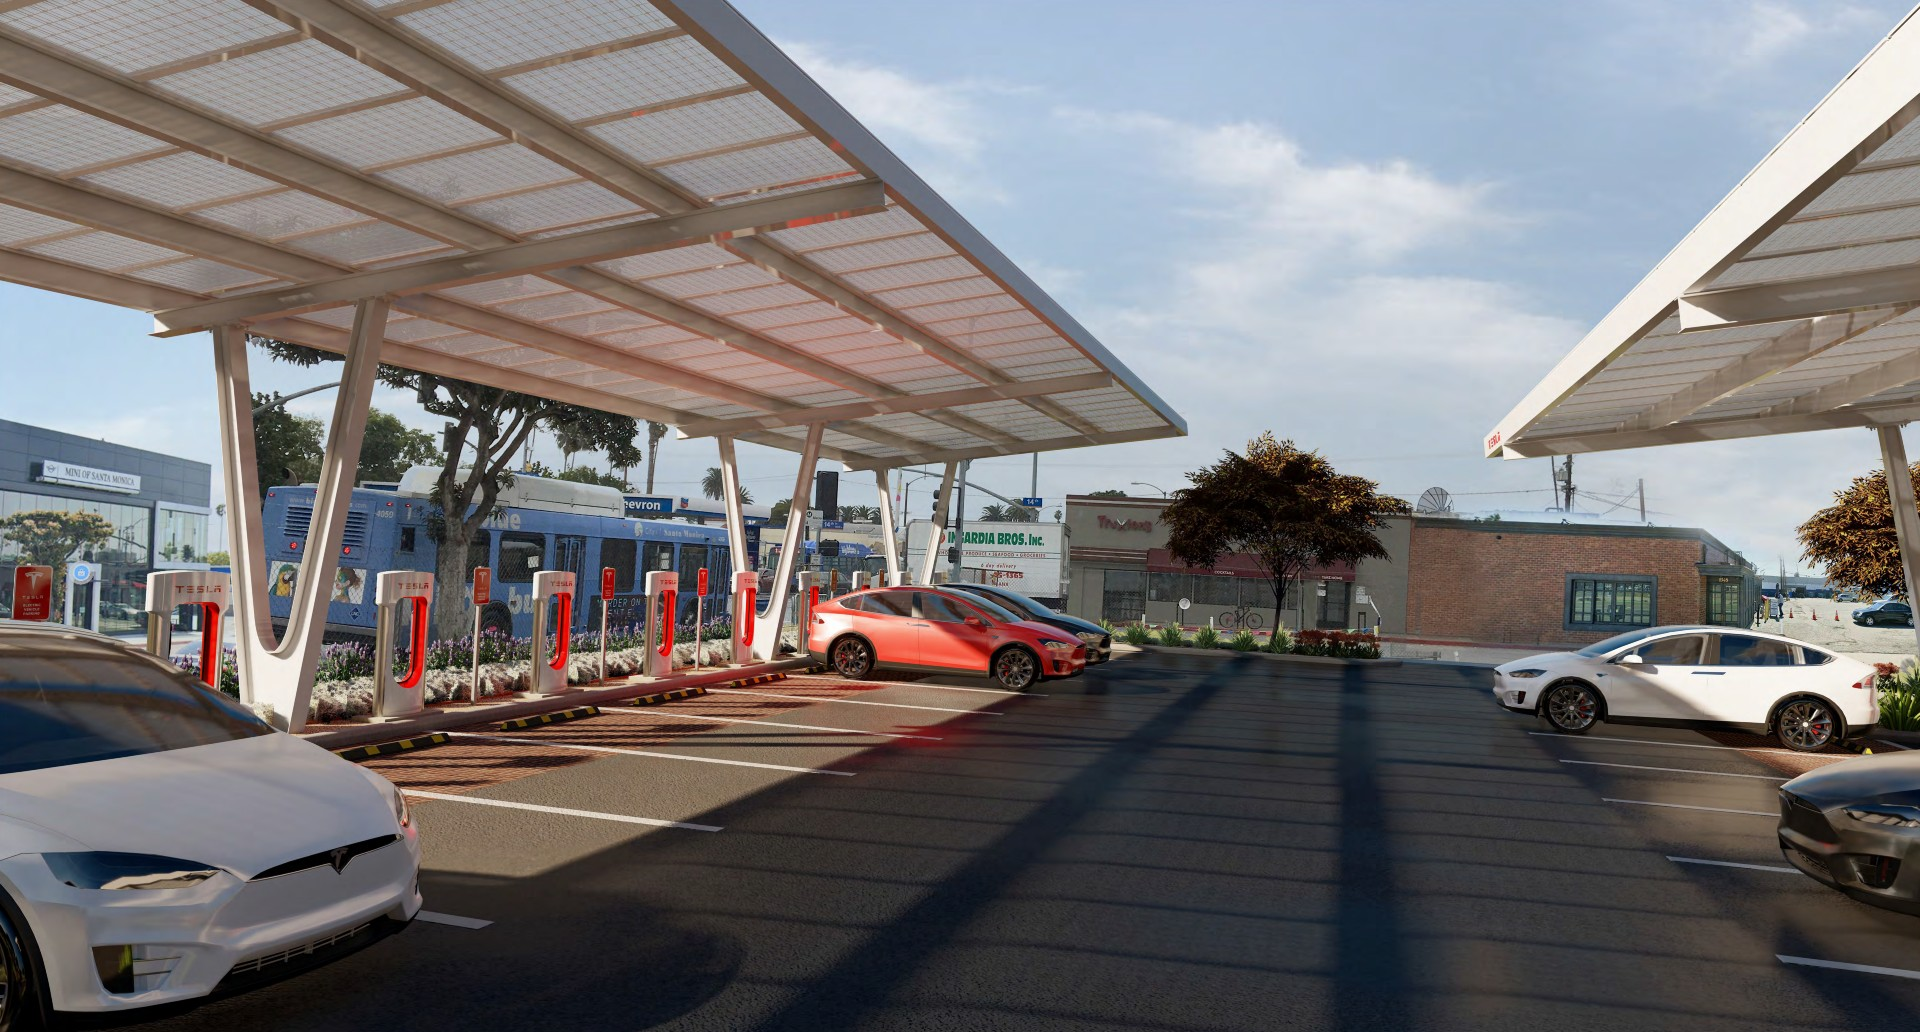 tesla-solar-canopy-after